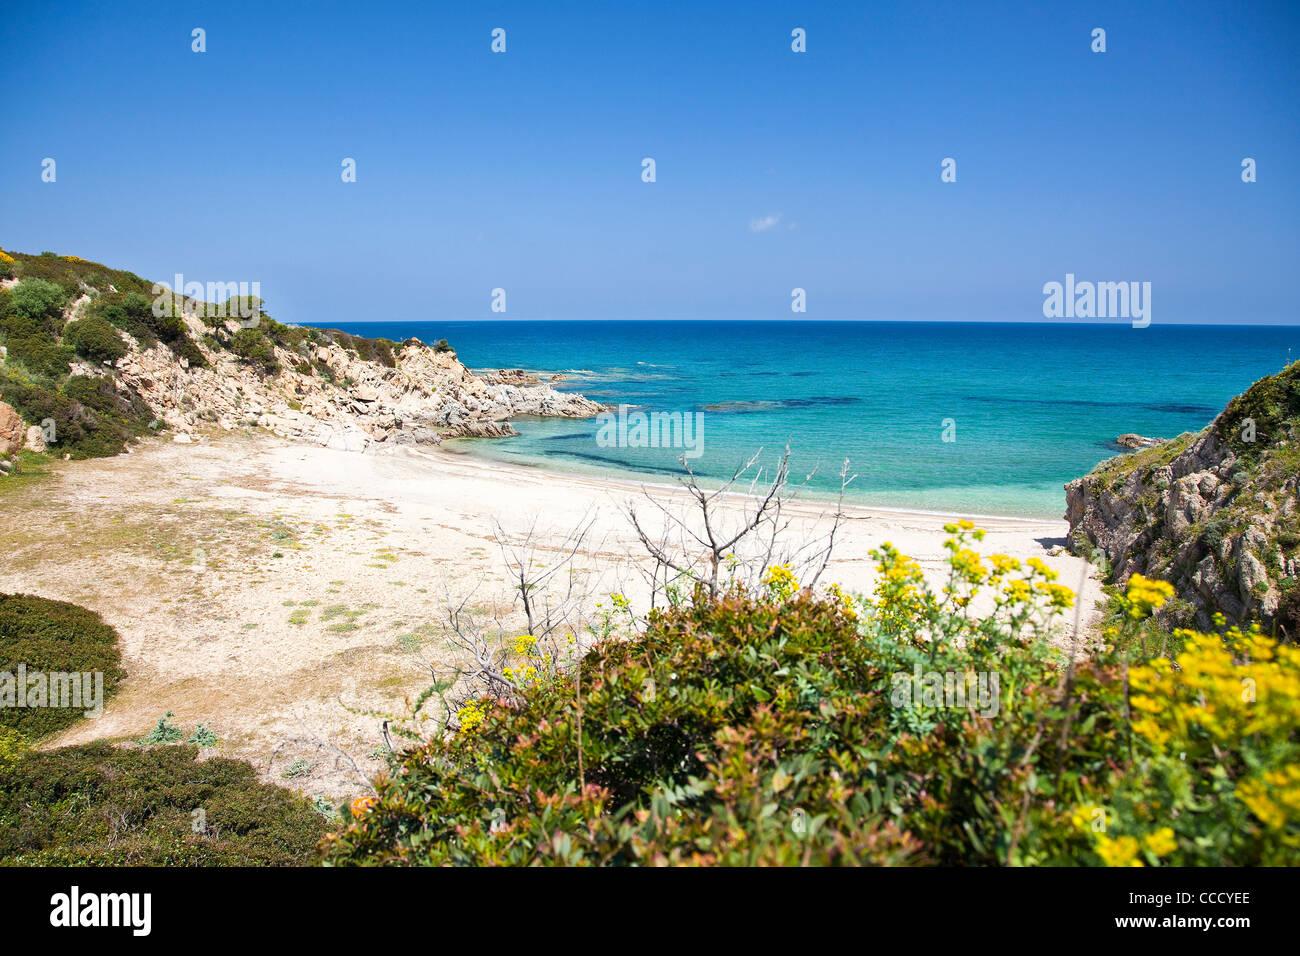 Portu de s'illixi, Cala Sa Figu, Capo Ferrato, Feraxi, Costa Rei. Muravera (CA), Sardinia, Italy, Europe - Stock Image